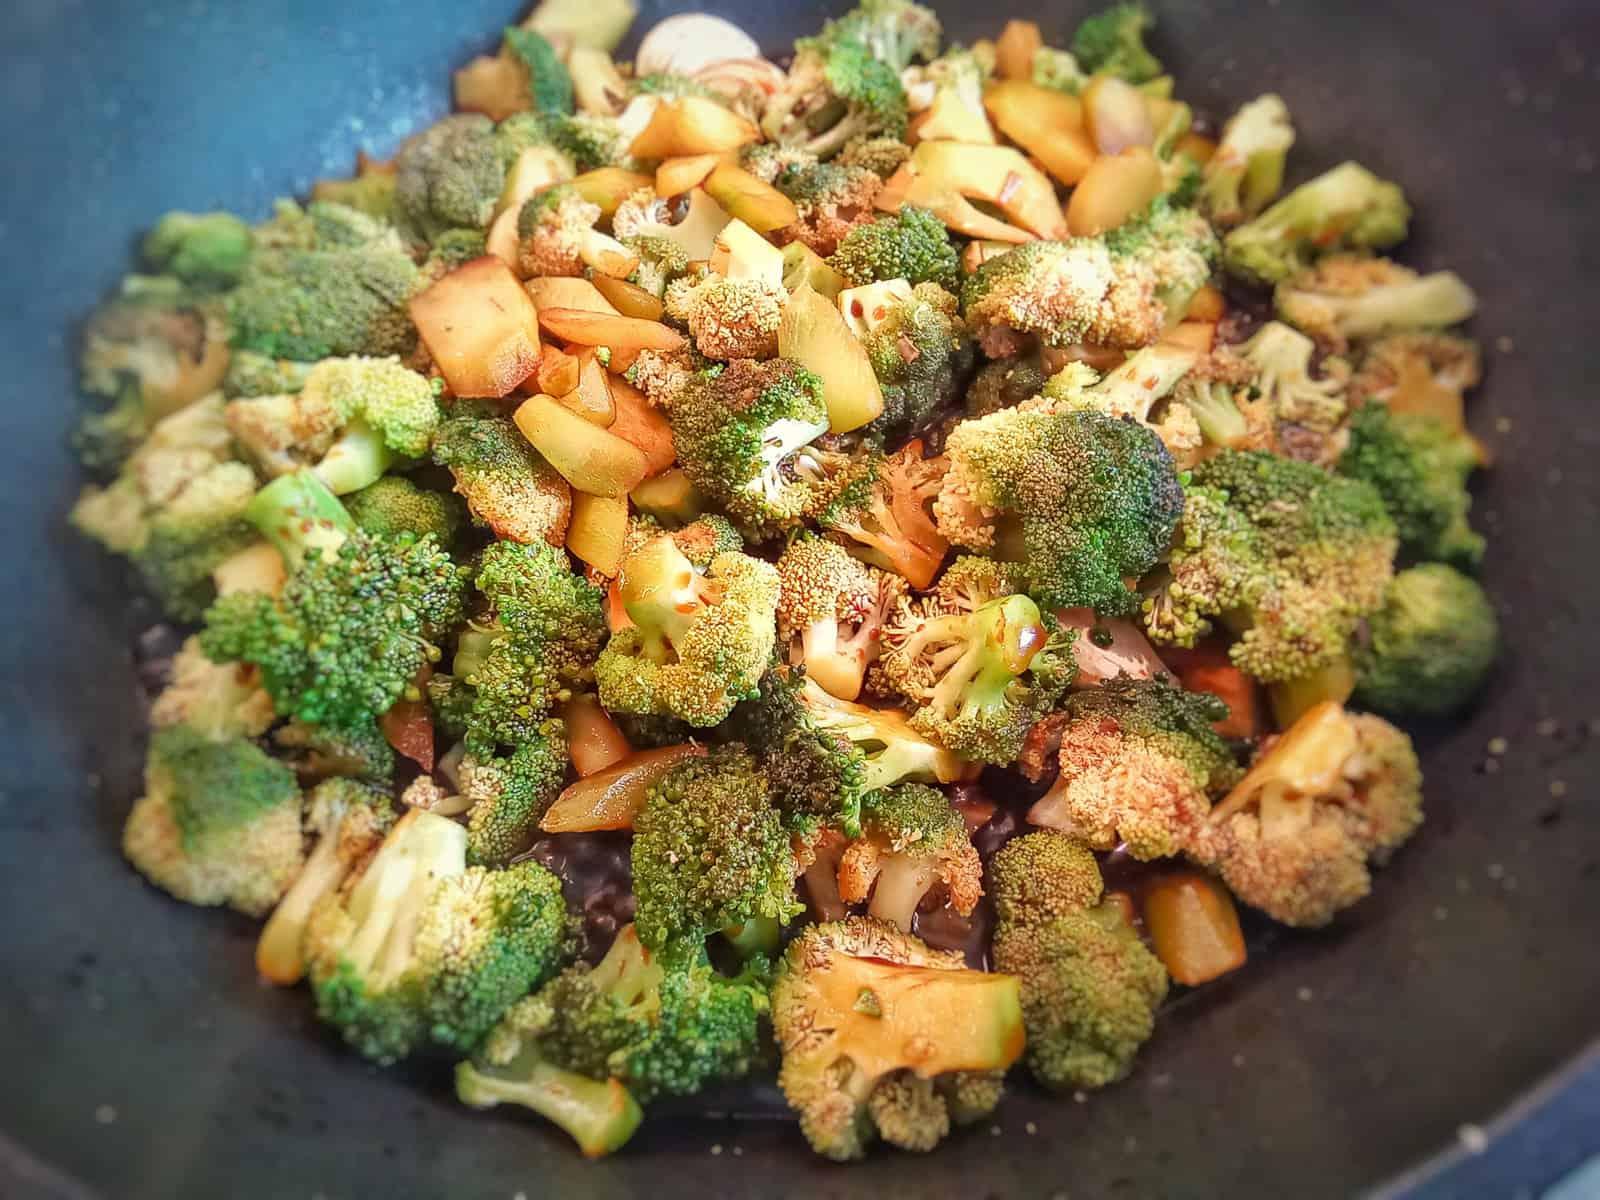 Brokkoli mit Sojasauce